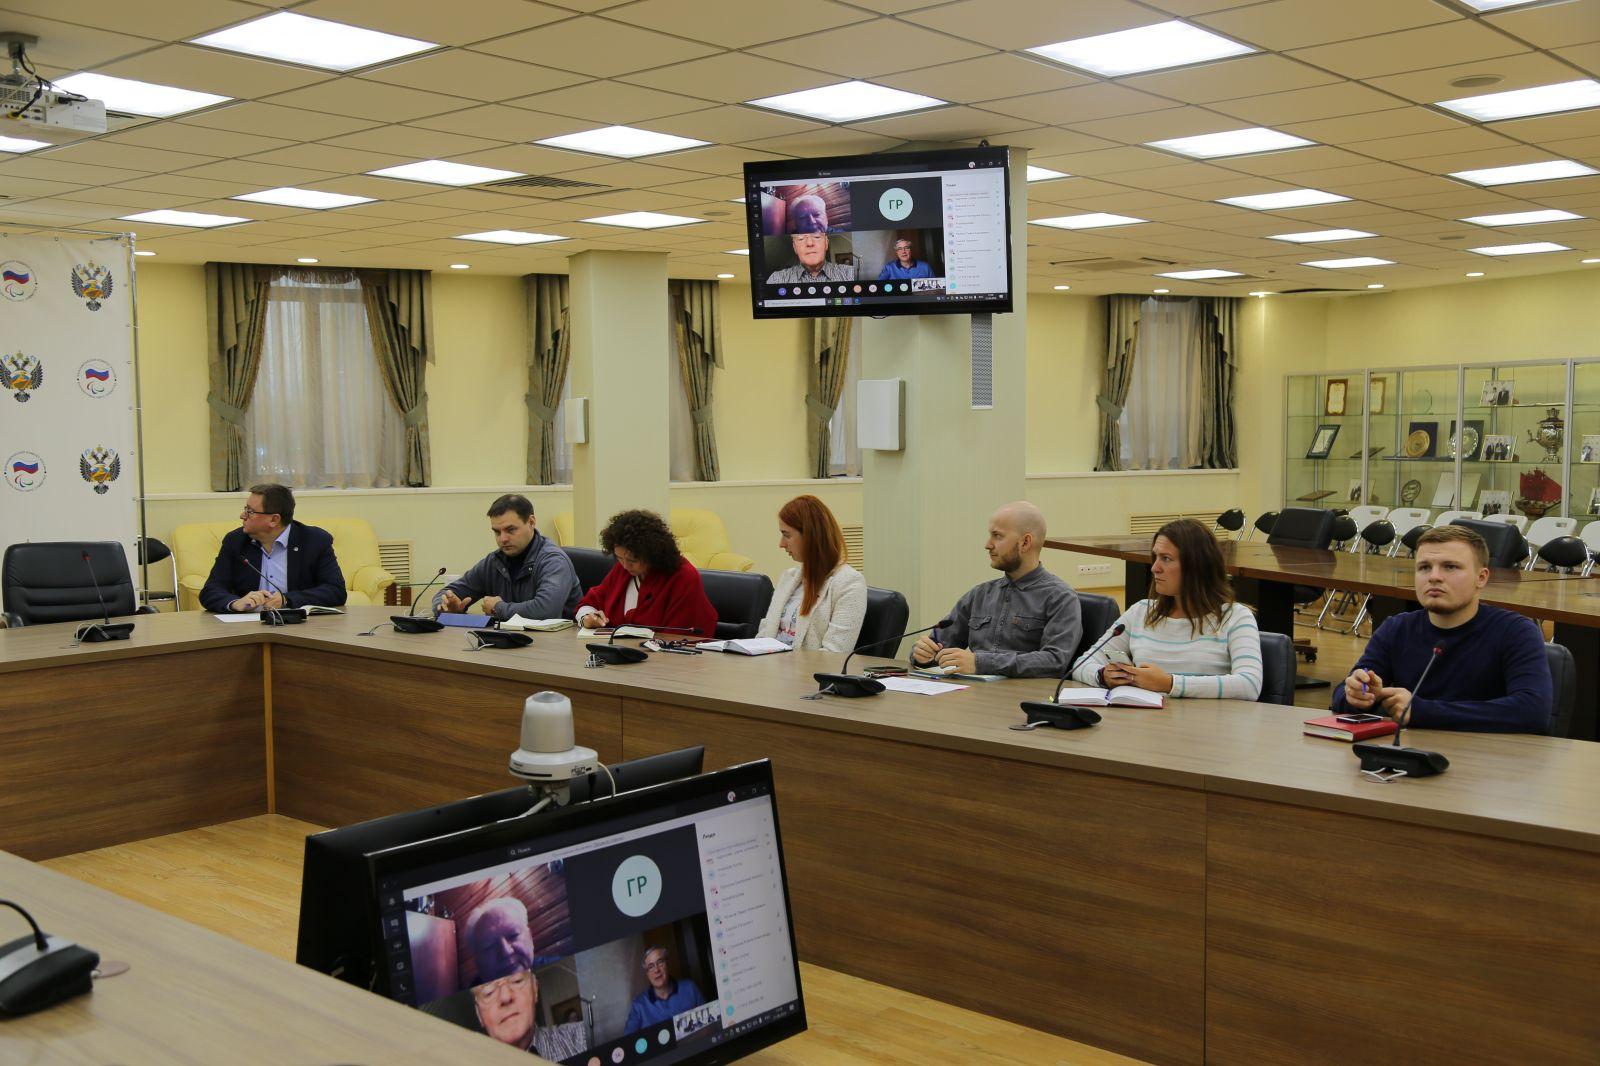 П.А. Рожков в режиме видеоконференцсвязи провел заседание Совета по координации программ, планов и мероприятий ПКР